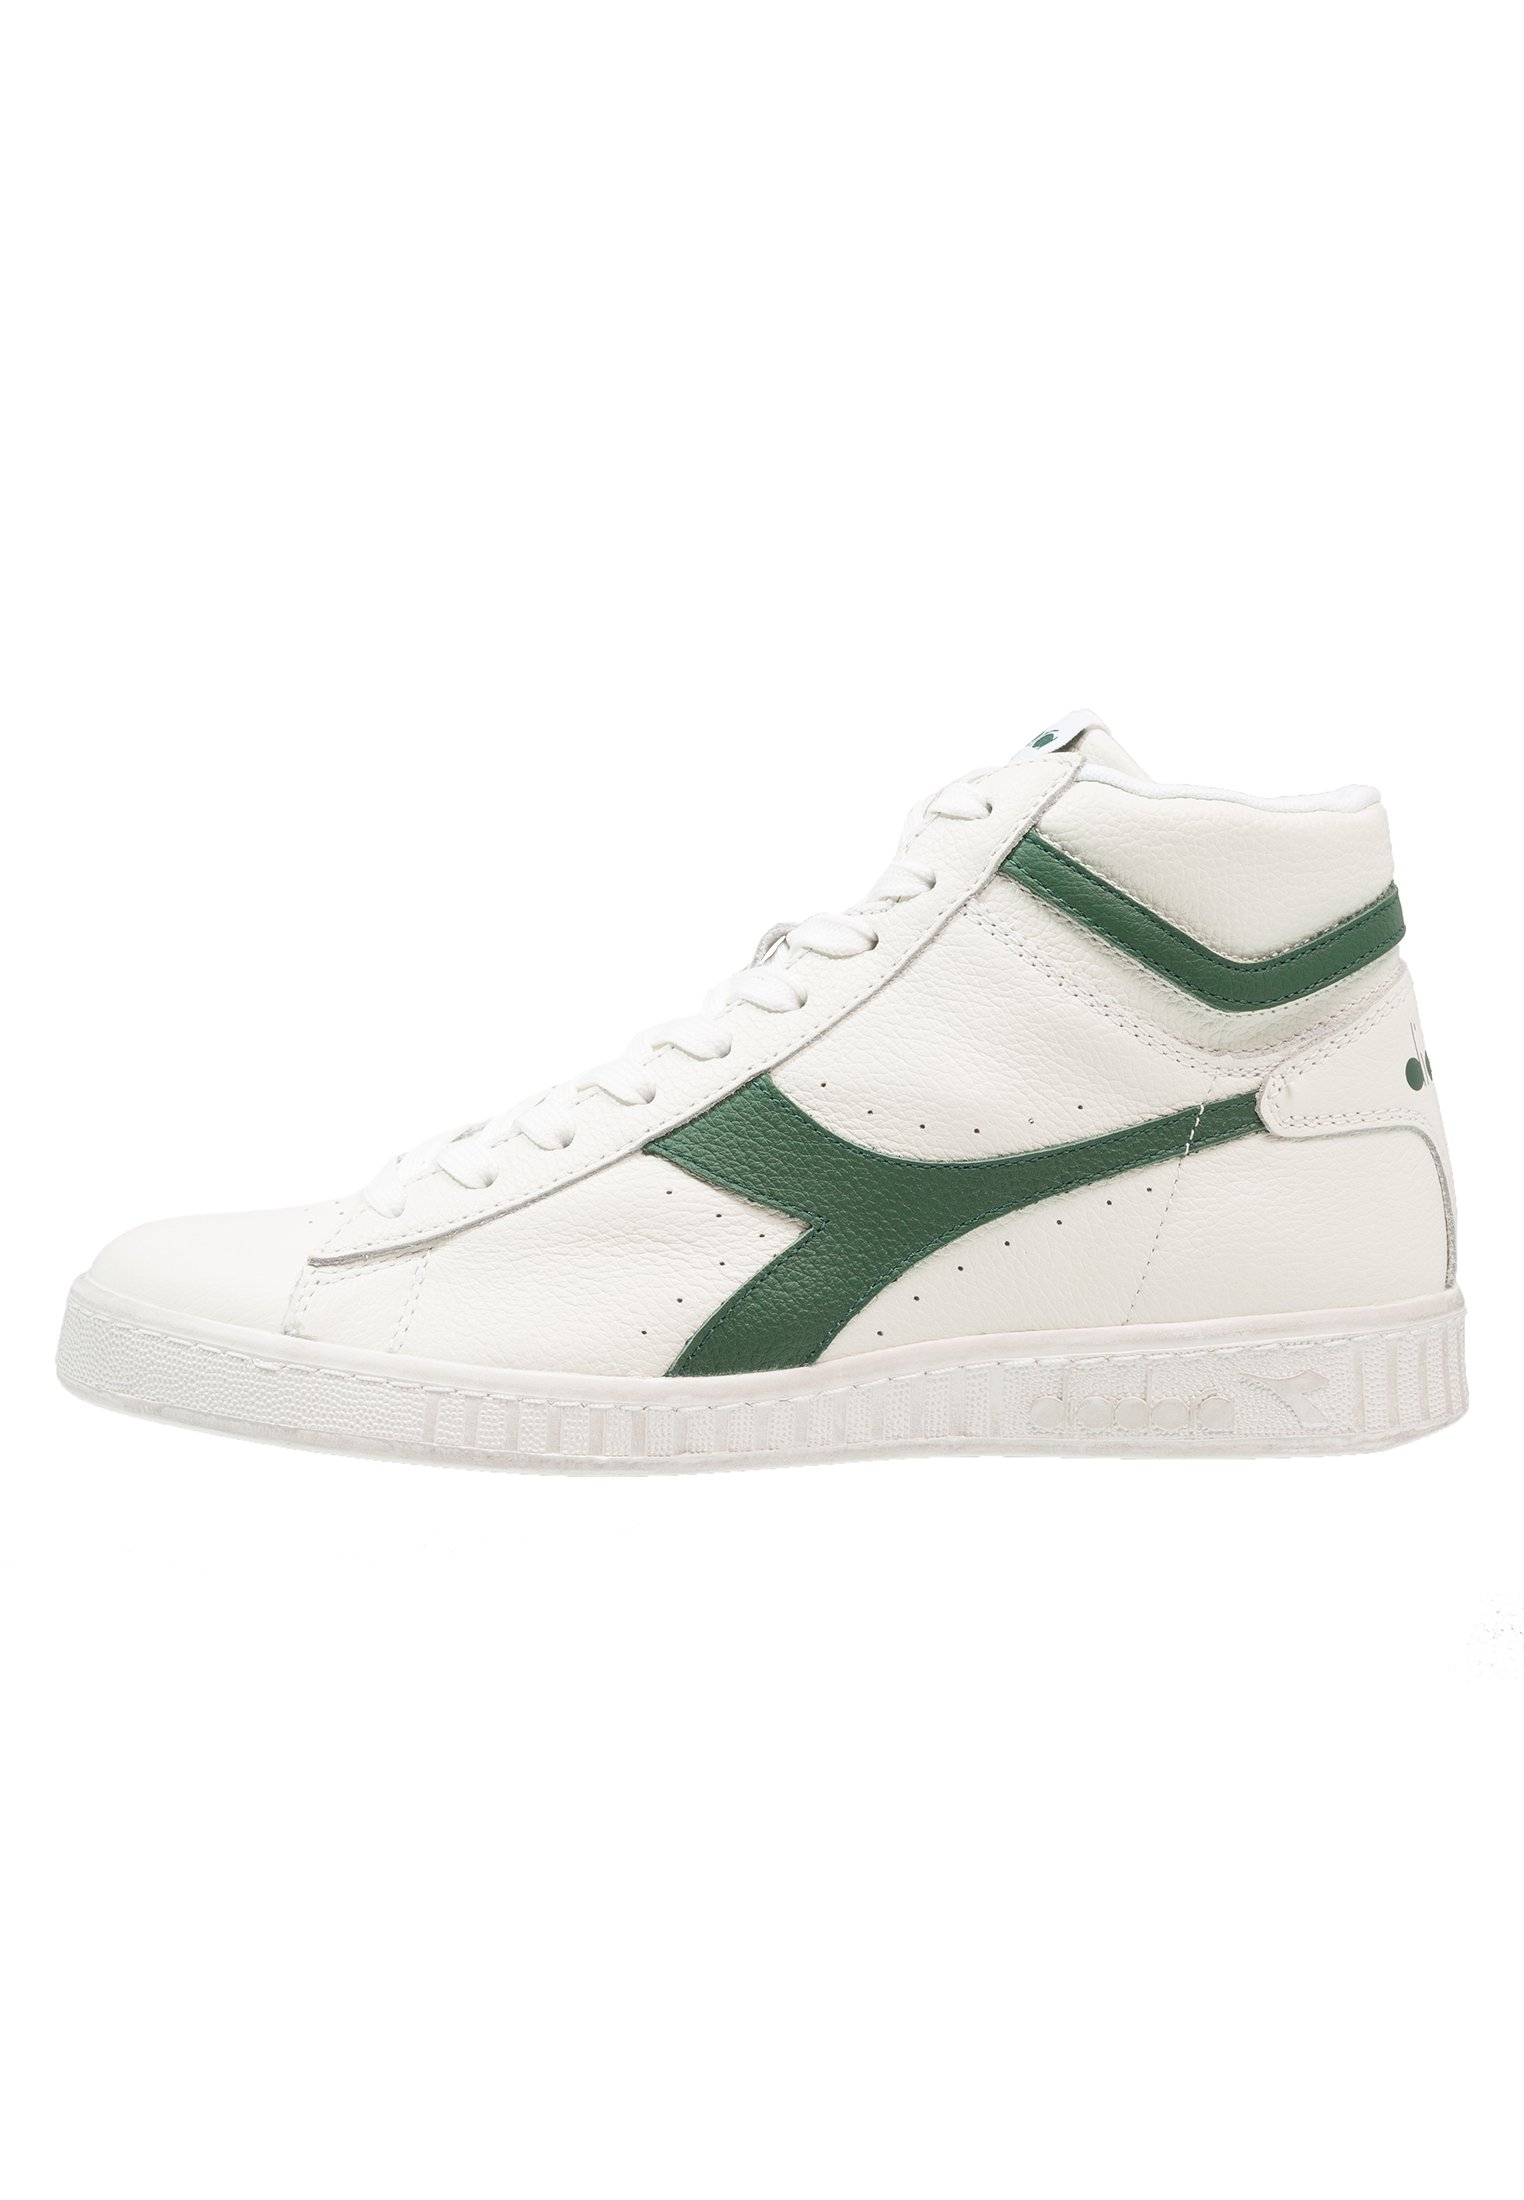 Herrer GAME WAXED - Sneakers high